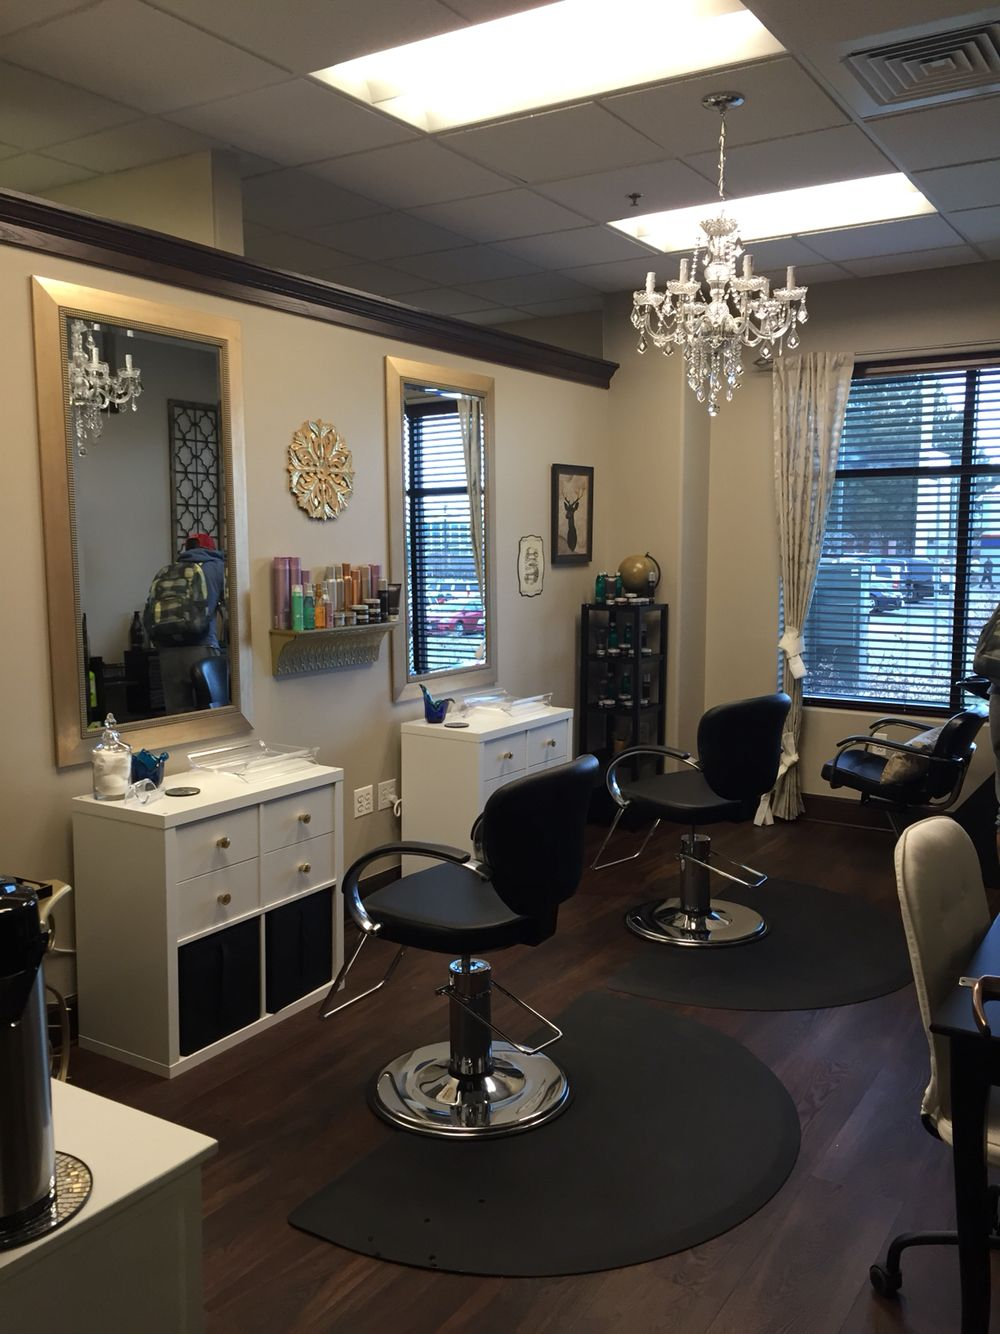 IKEA salon decor salon suite decor  Salon decororganization in 2019  Home hair salons